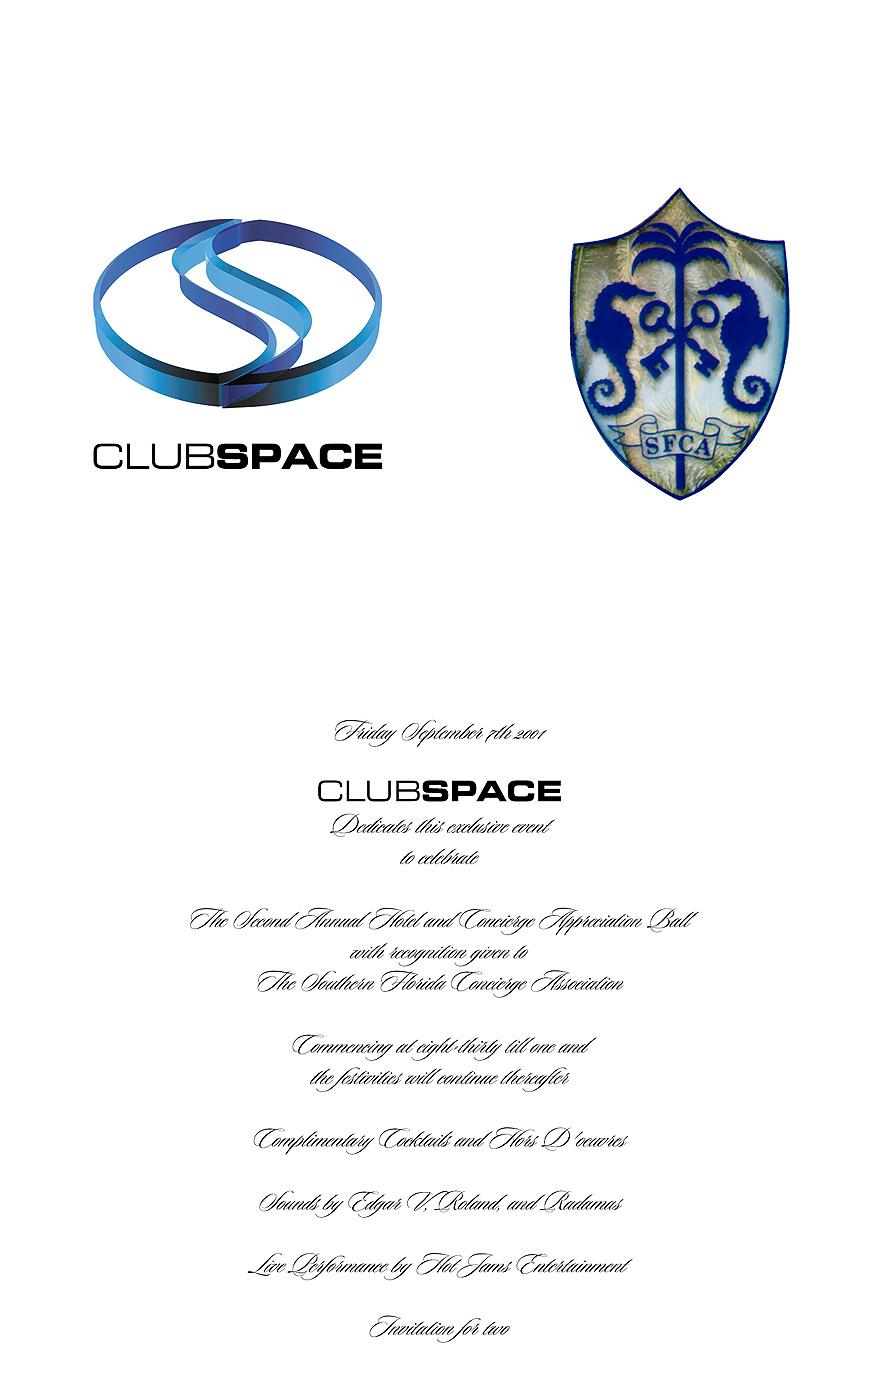 SFCA Appreciation Ball at Club Space